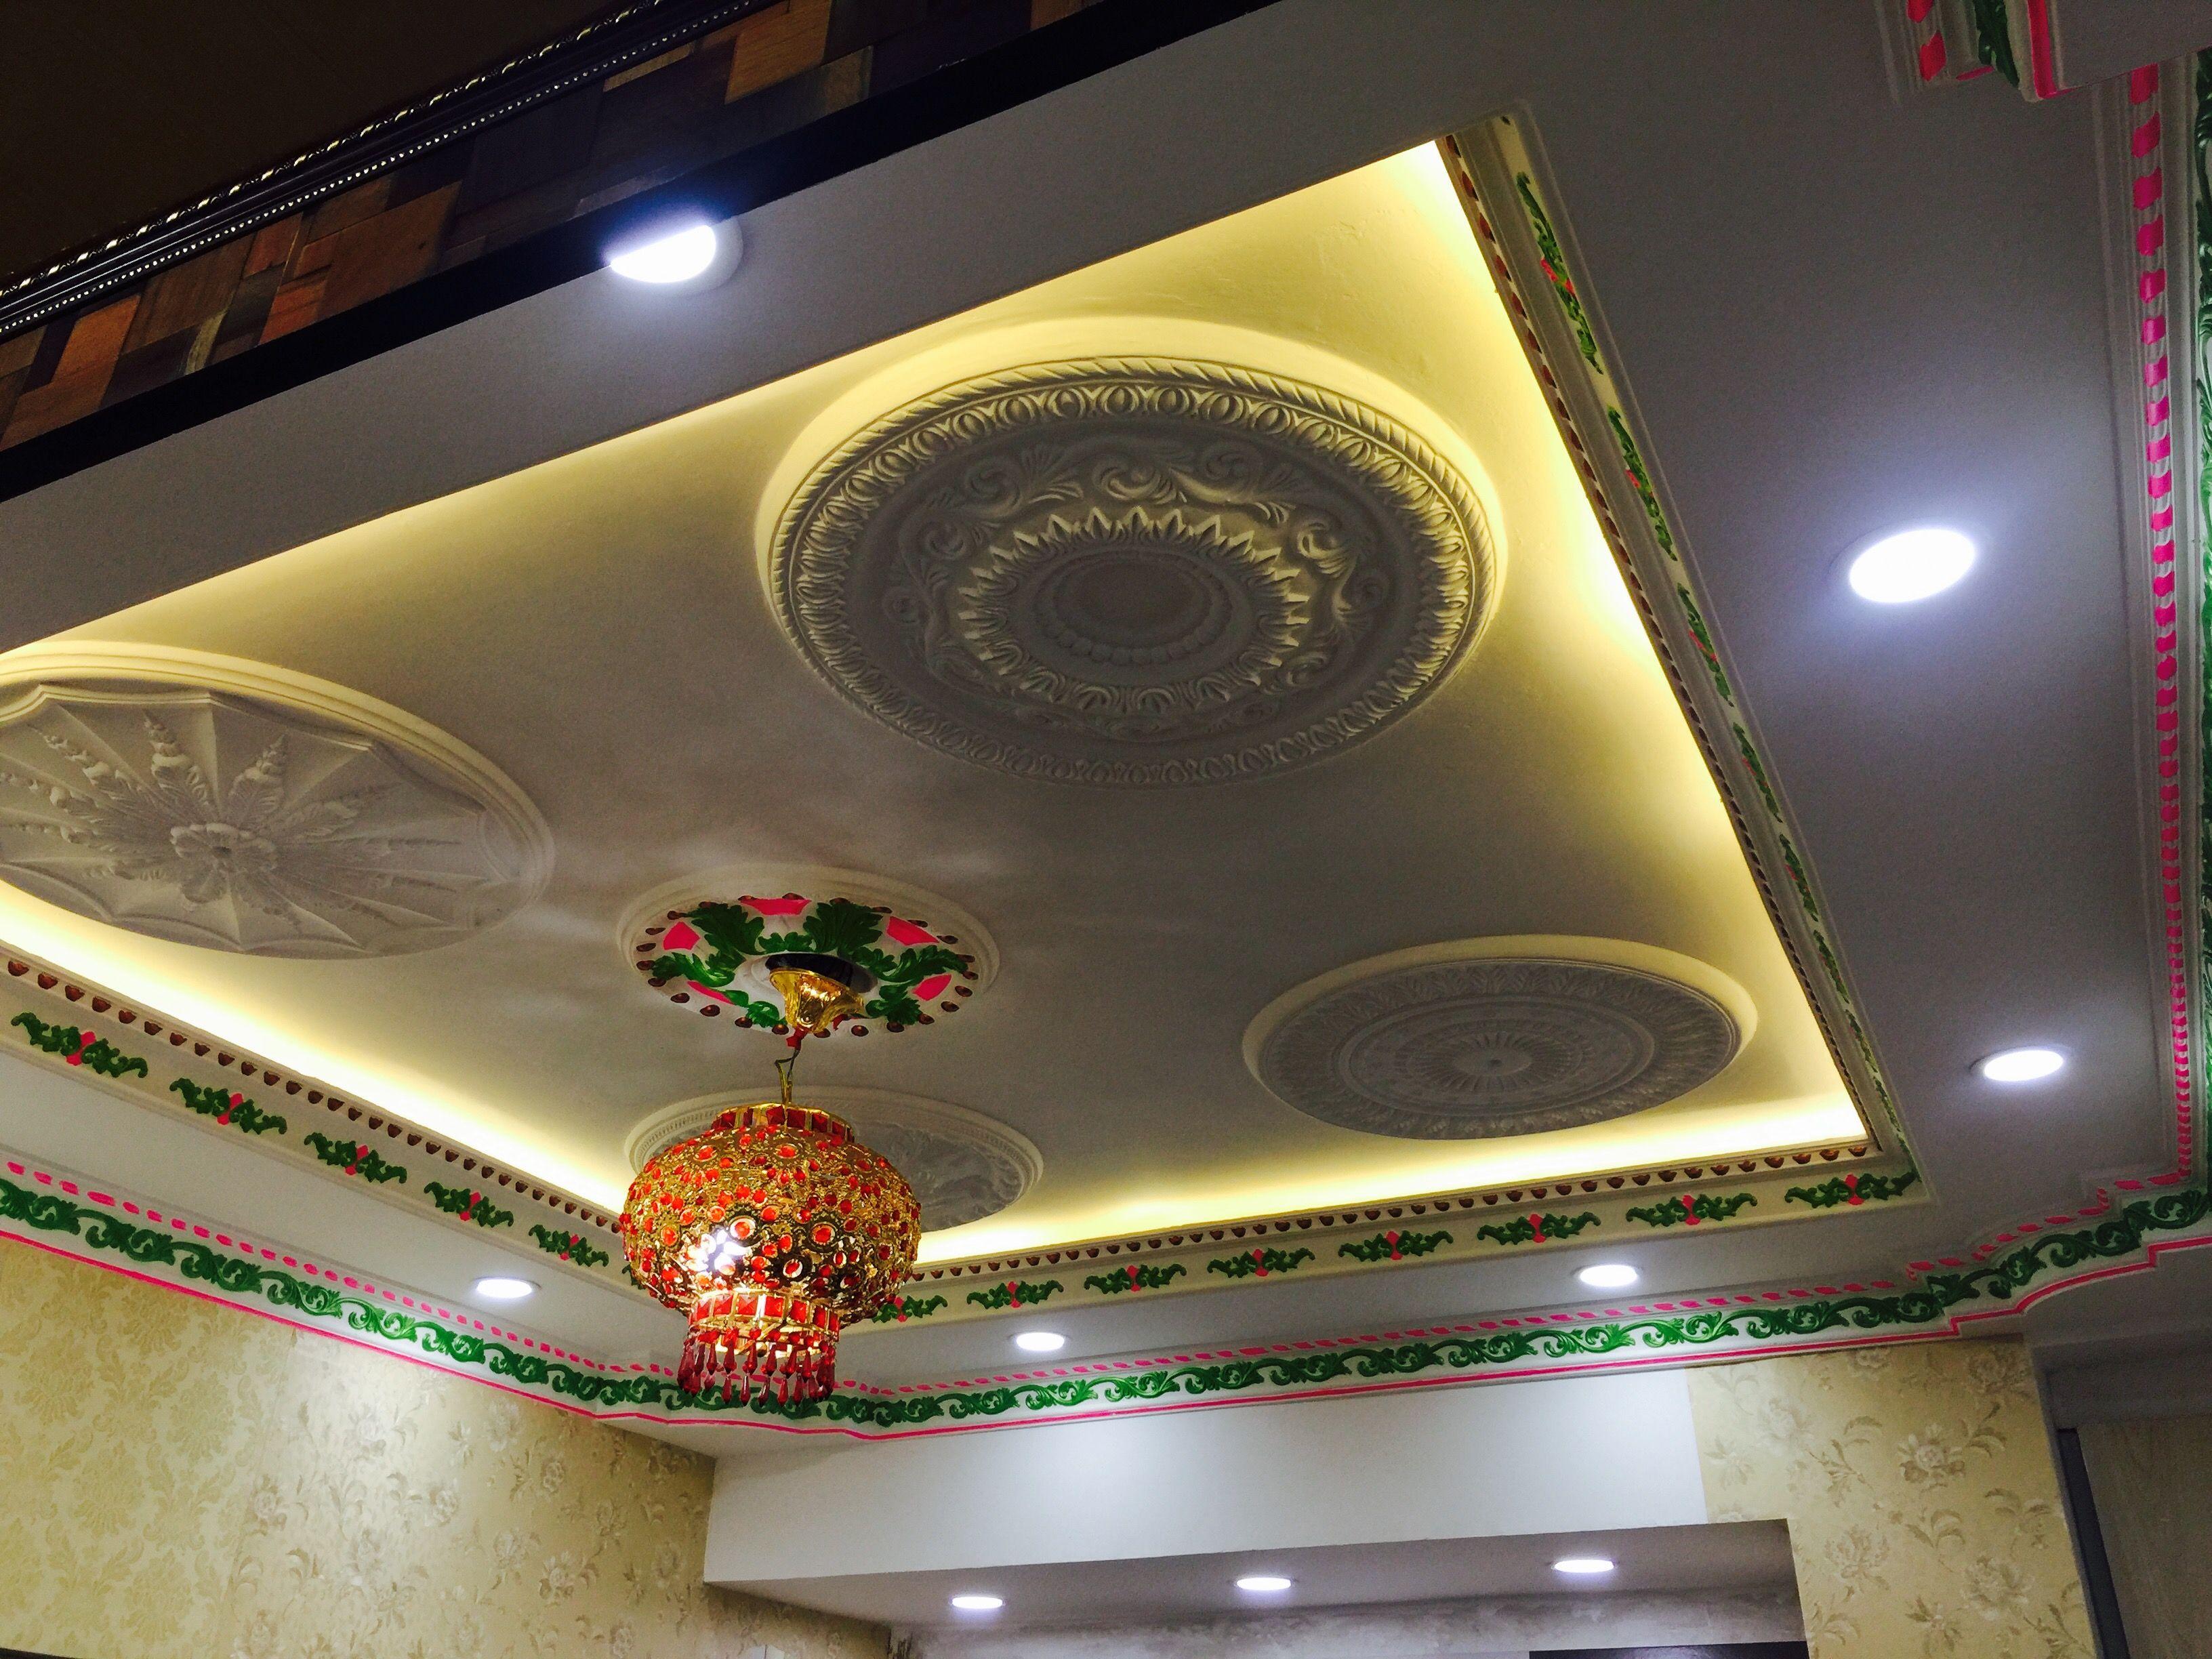 Manufacturer of gypsum false ceiling gypsum ceiling work gypsum manufacturer of gypsum false ceiling gypsum ceiling work gypsum ceiling tile gypsum ceiling doublecrazyfo Gallery